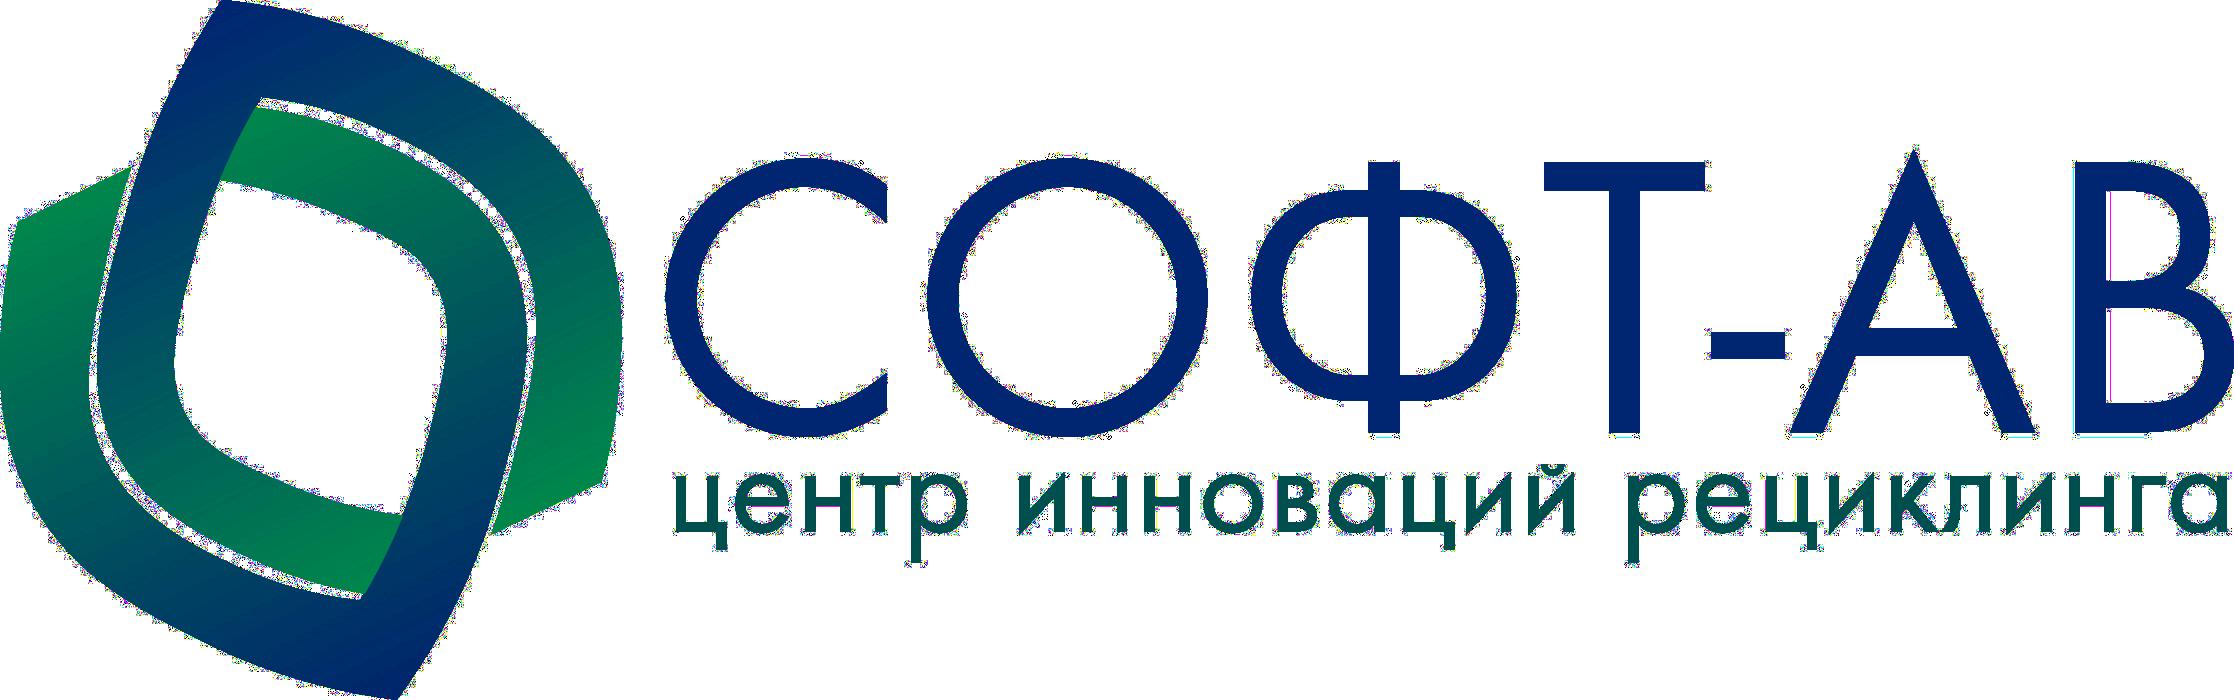 Центр инноваций рециклинга СОФТ-АВ